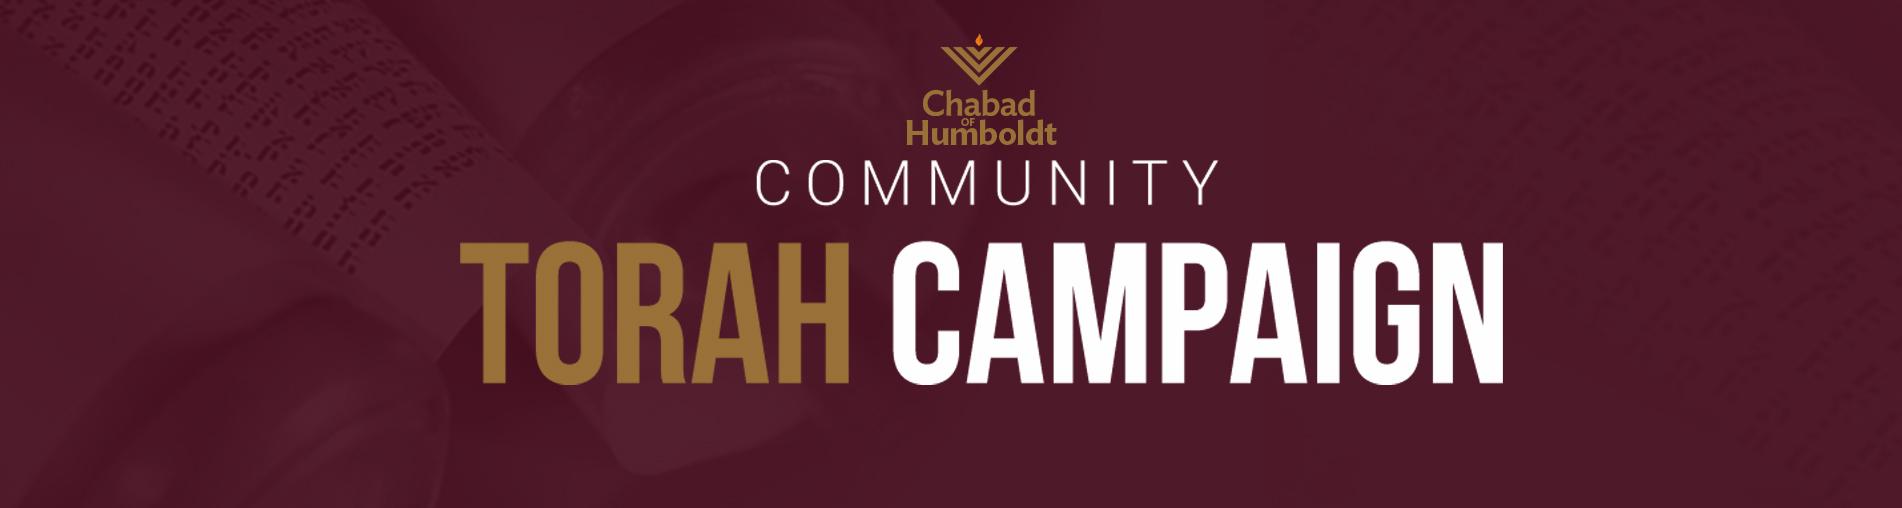 Torah campaign.jpg